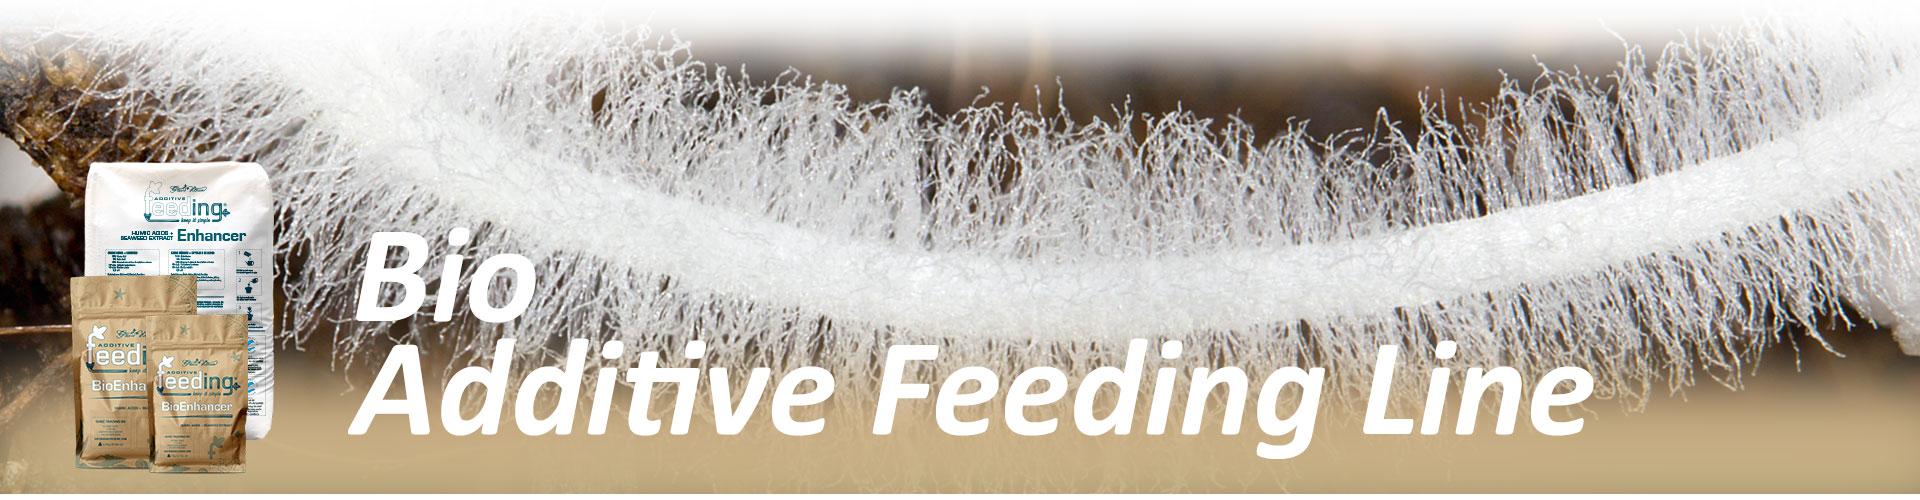 Green House Feeding Bio Additives